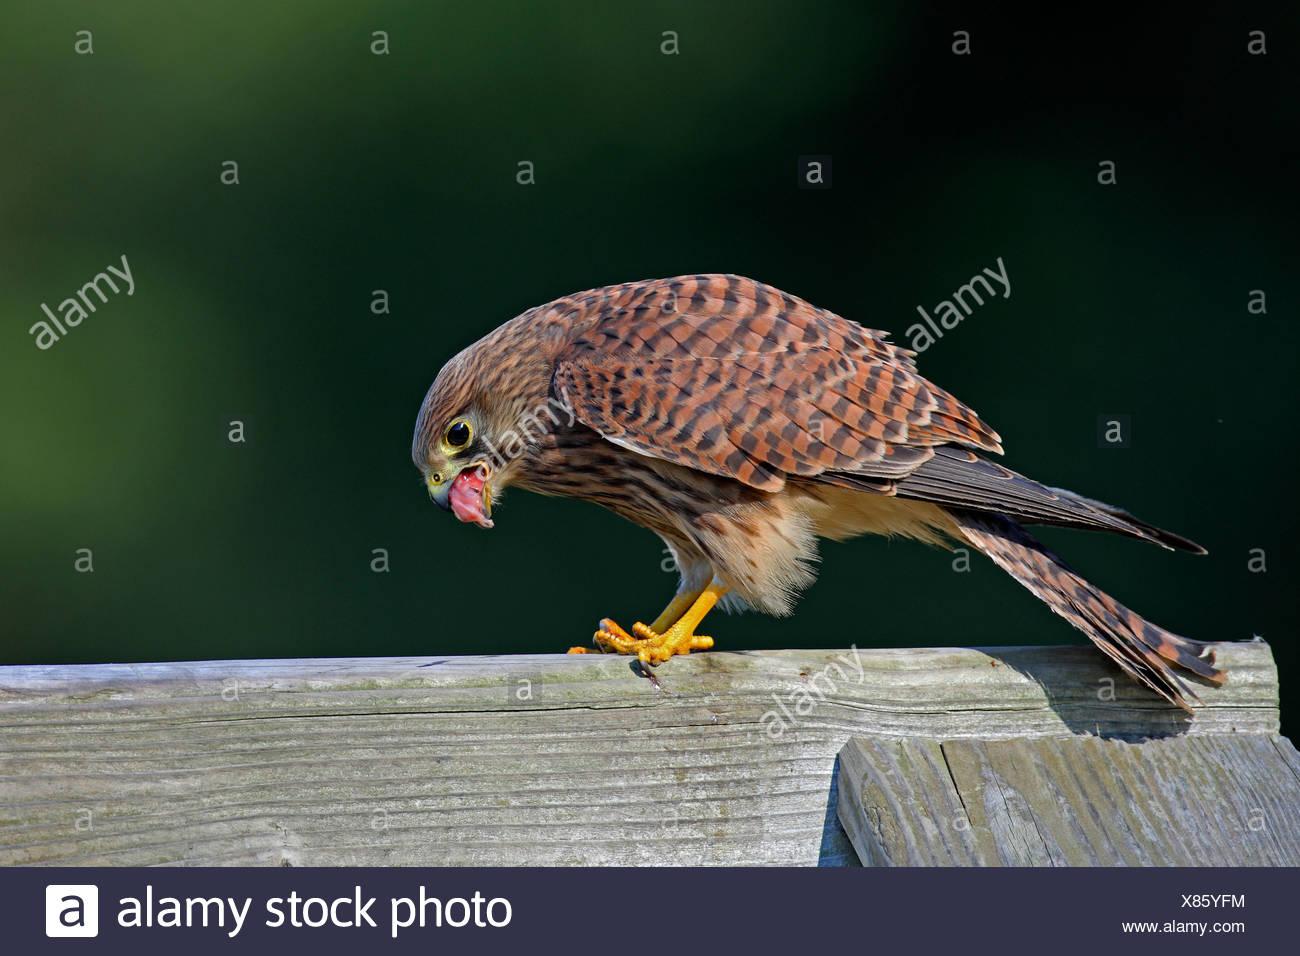 common kestrel (Falco tinnunculus), female with prey, Germany, North Rhine-Westphalia - Stock Image